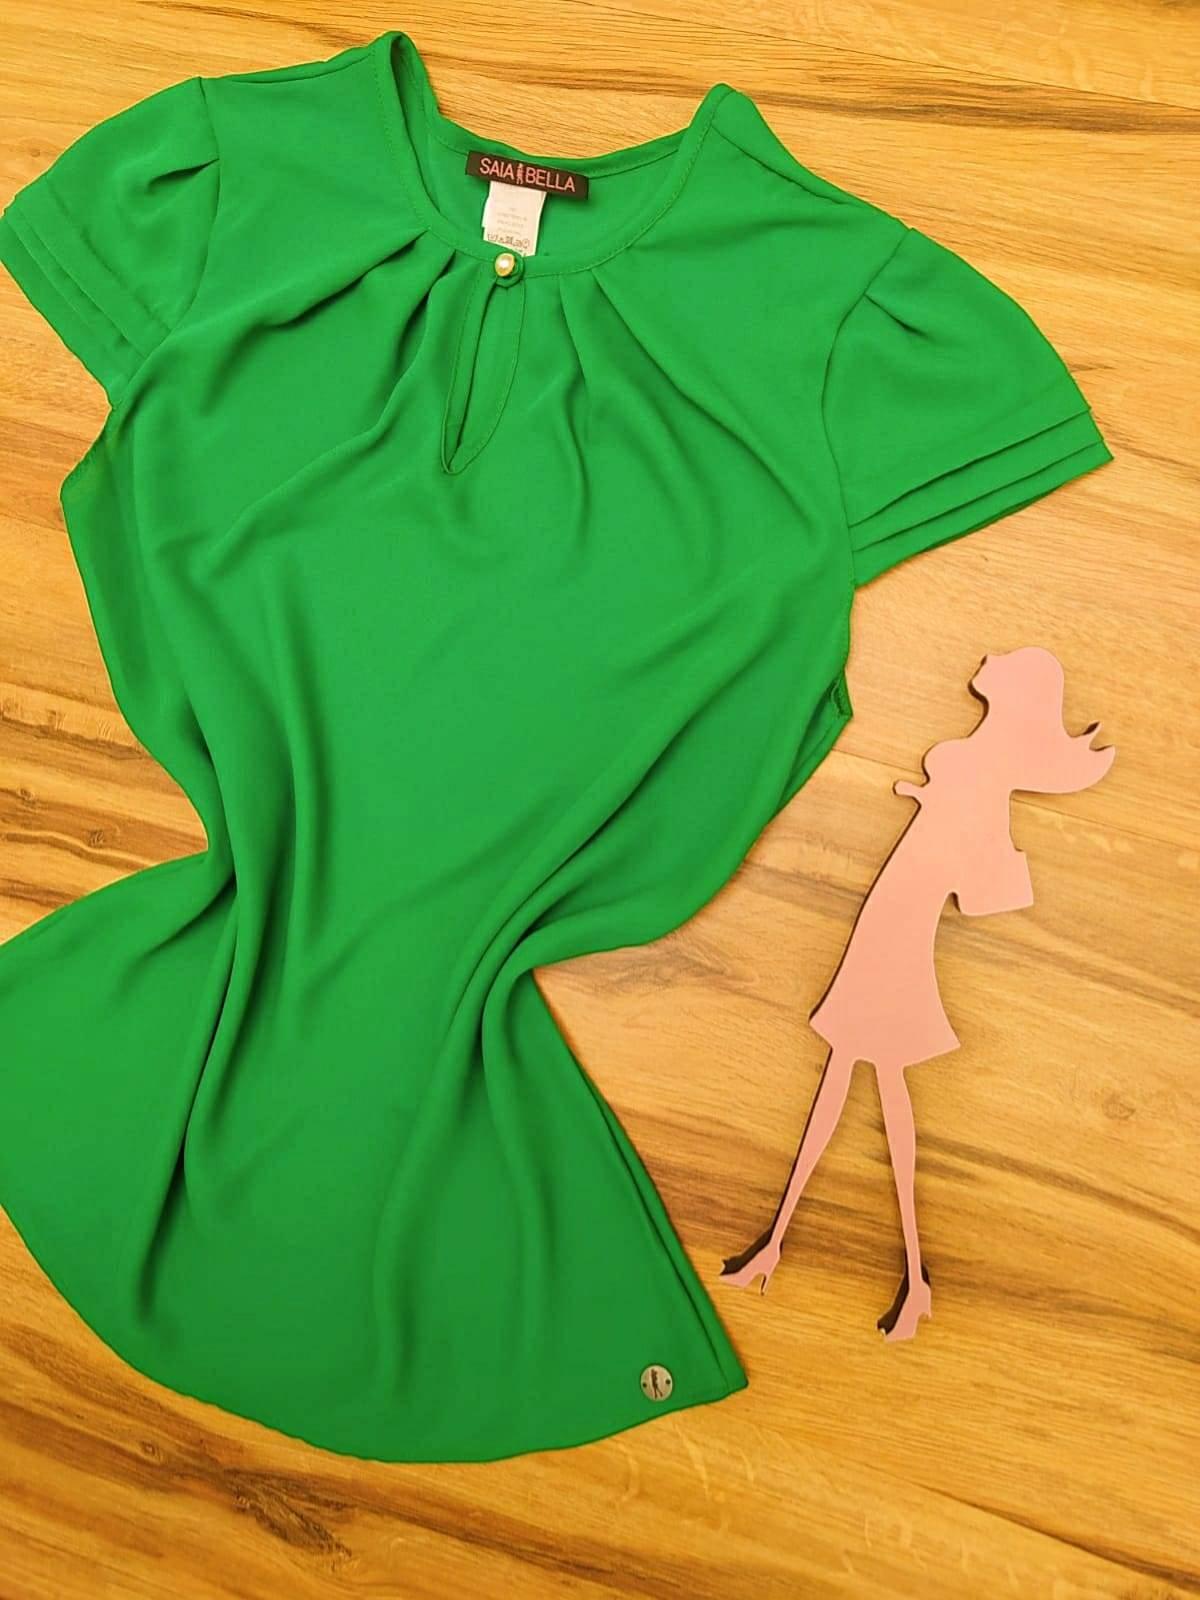 Blusa Jéssica Saia Bella - SB8018850 Verde Bandeira